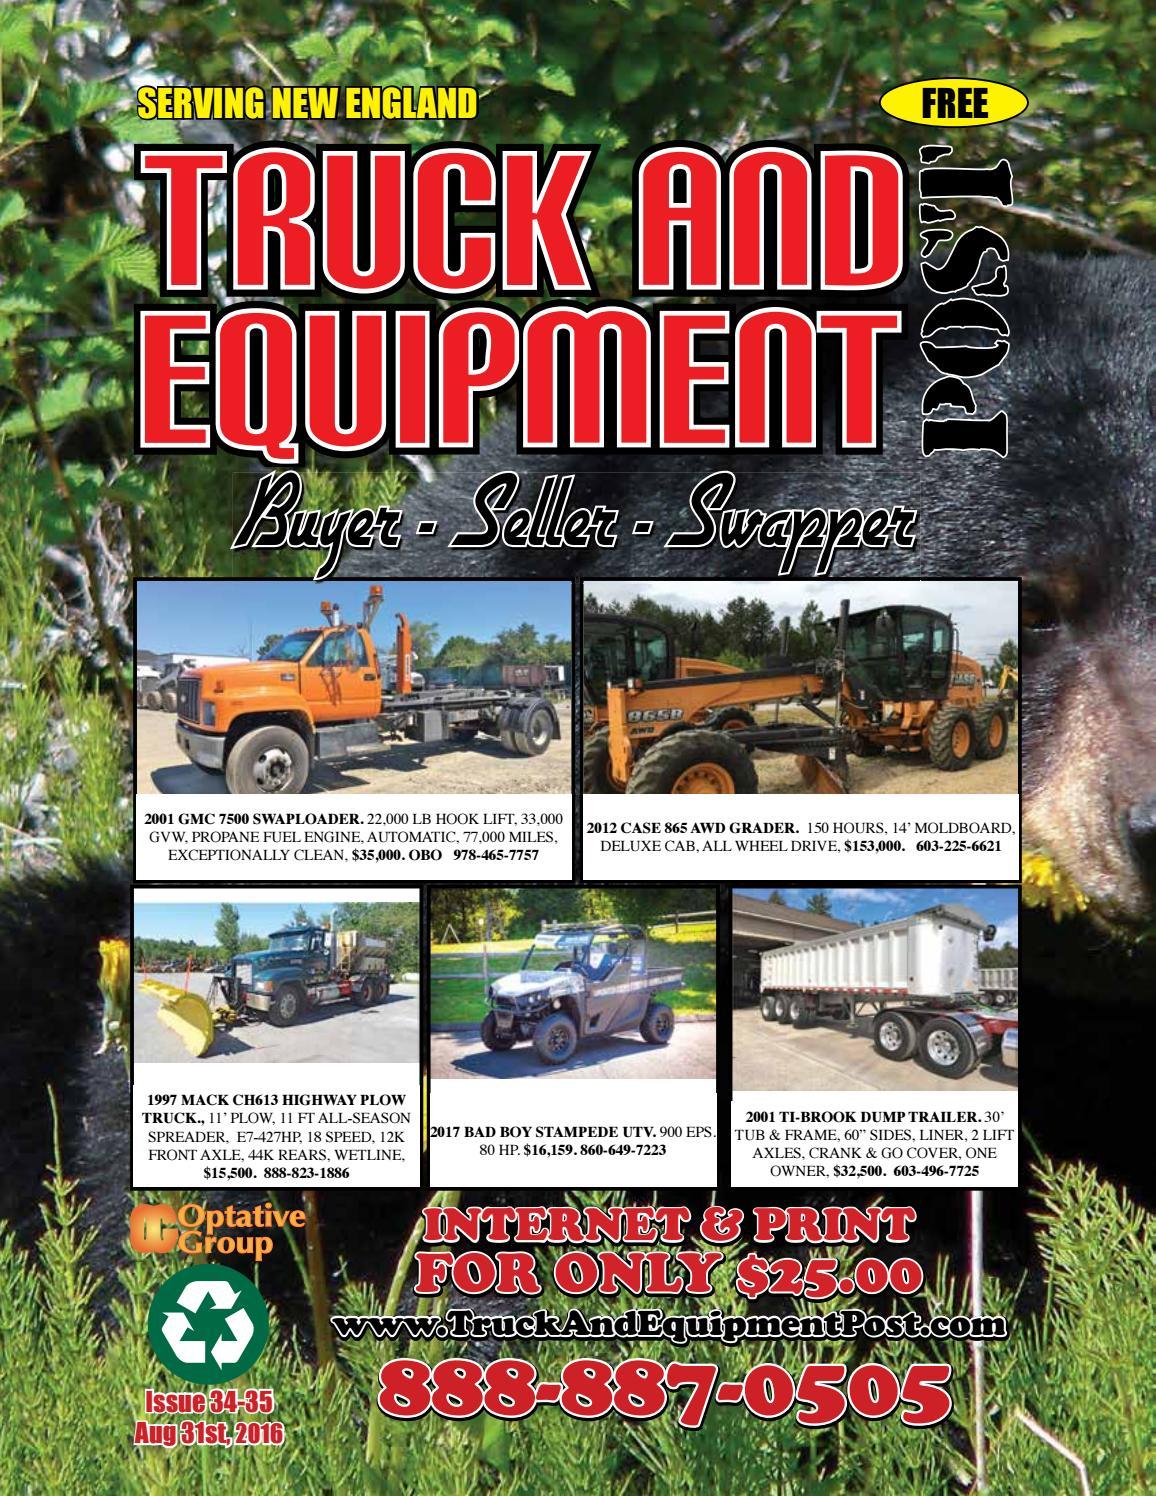 Truck equipment post 34 35 2016 by 1ClickAway - issuu